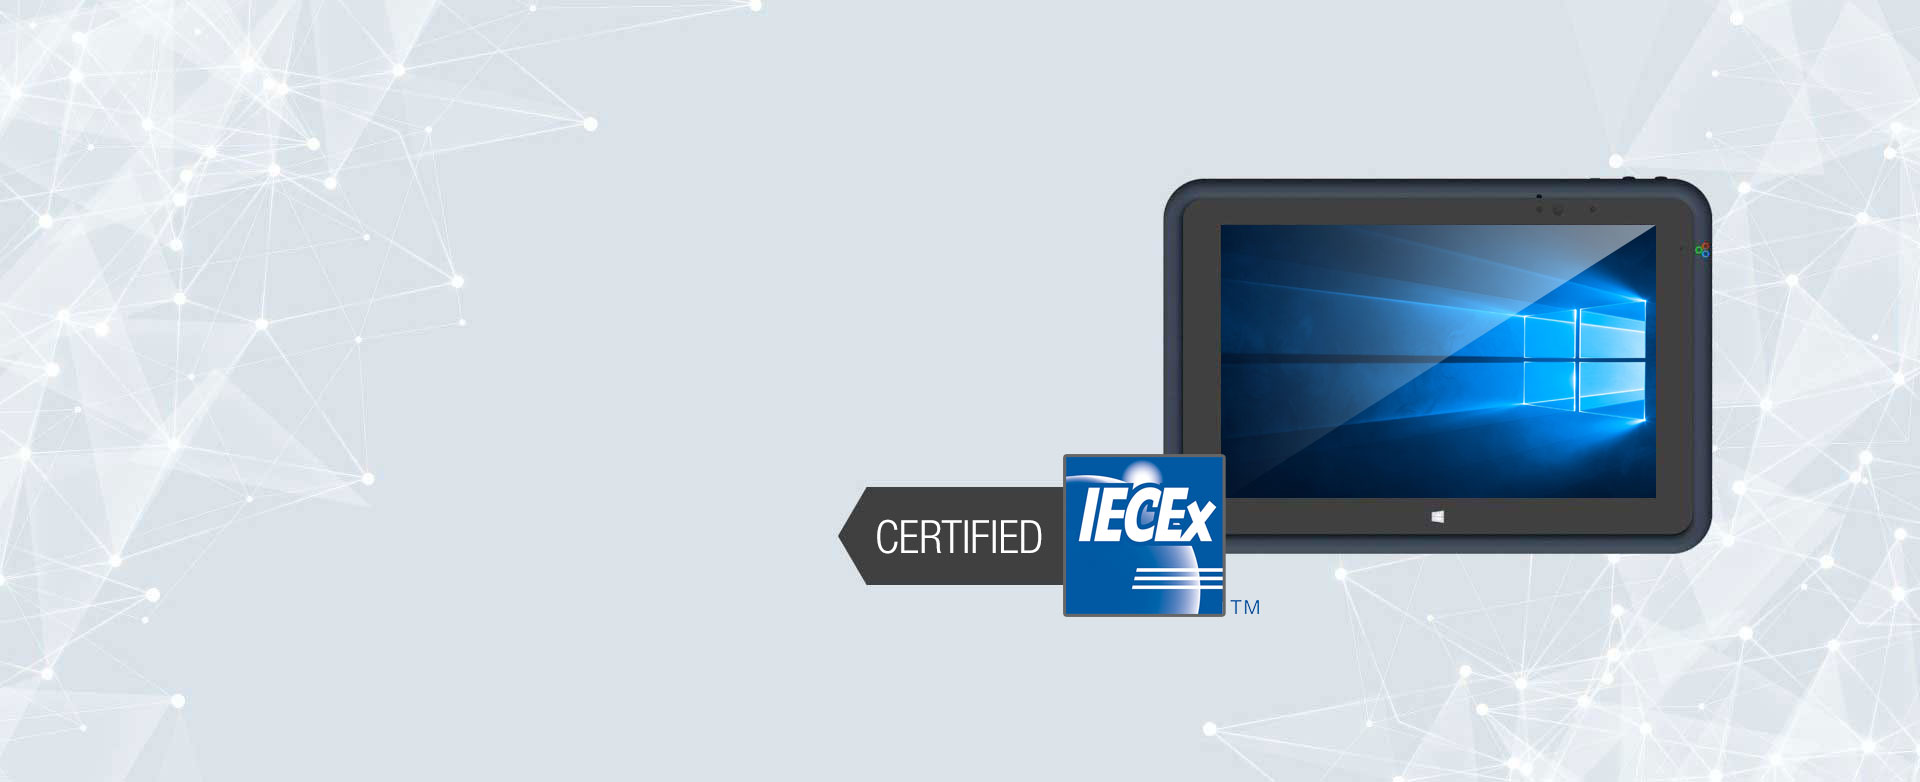 Aegex Intrinsically Safe Tablet